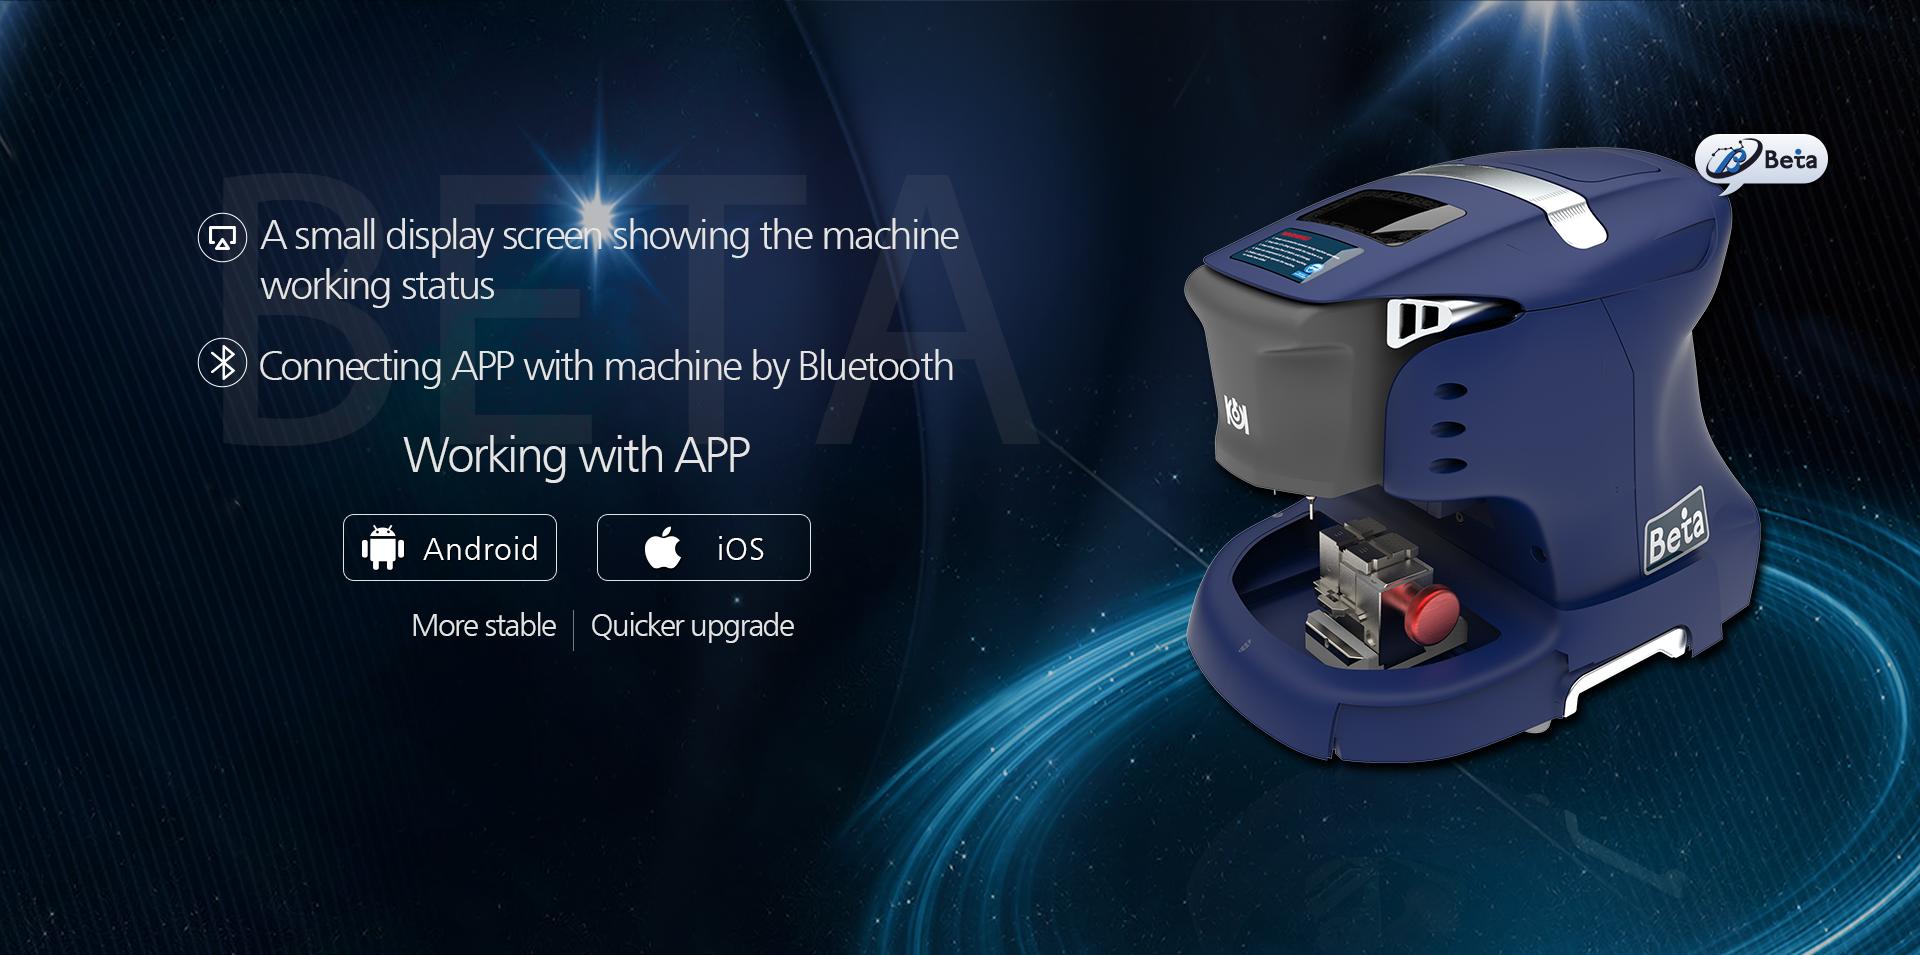 Beta key cutting machine